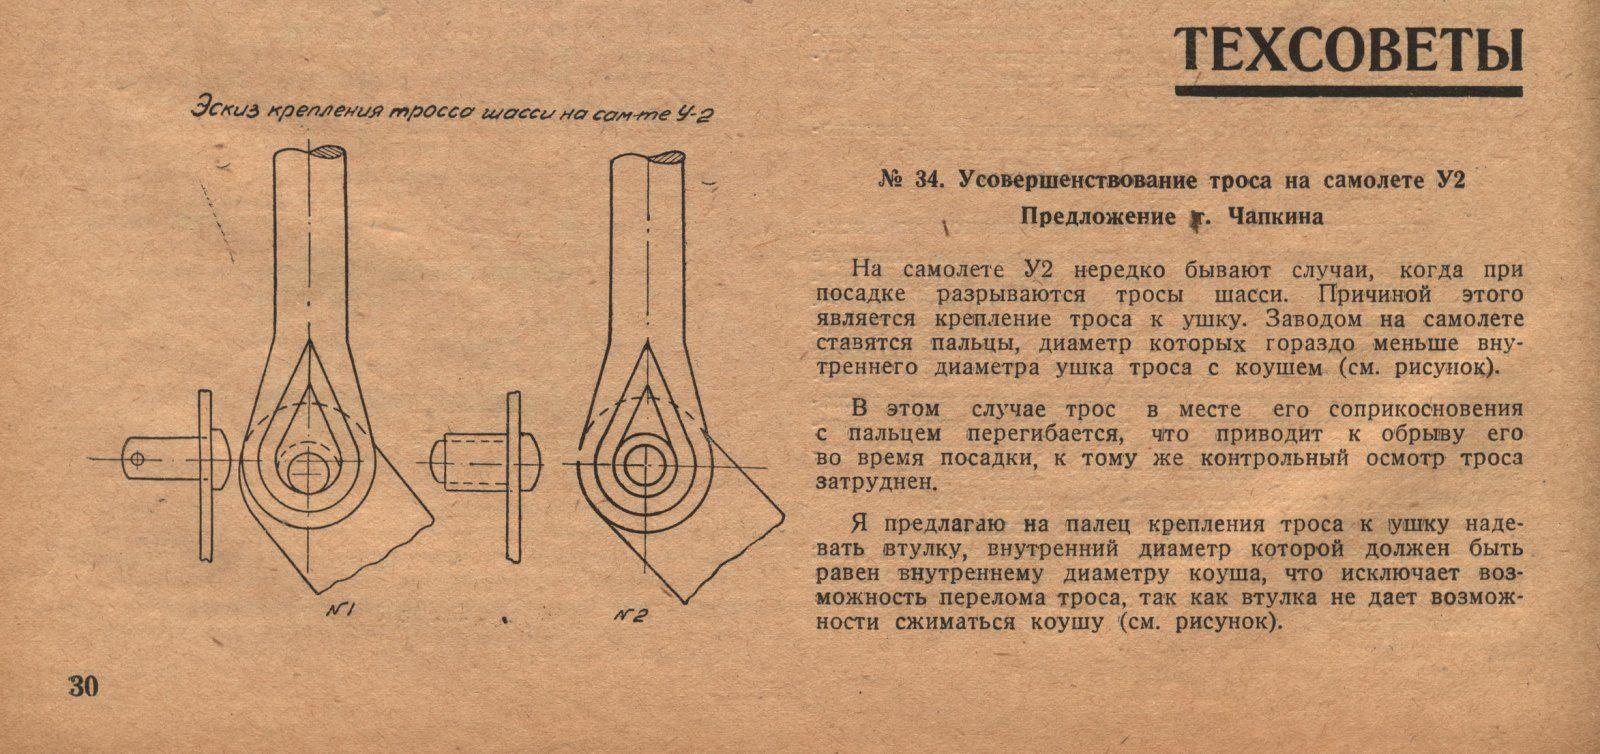 У-2.jpg